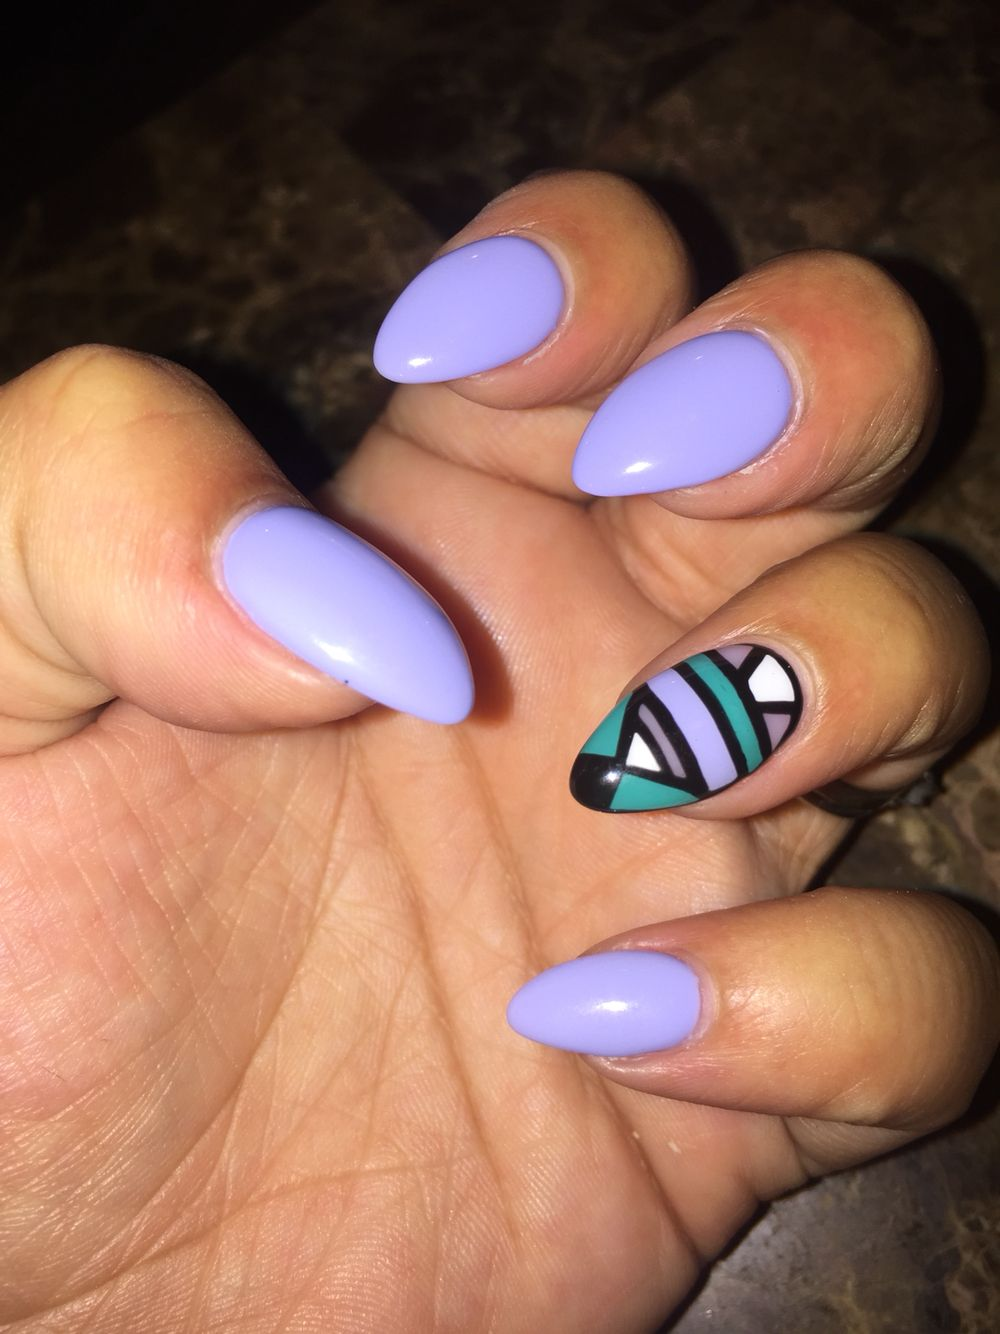 Almond shaped nails periwinkle gel nails design | Nails | Pinterest ...